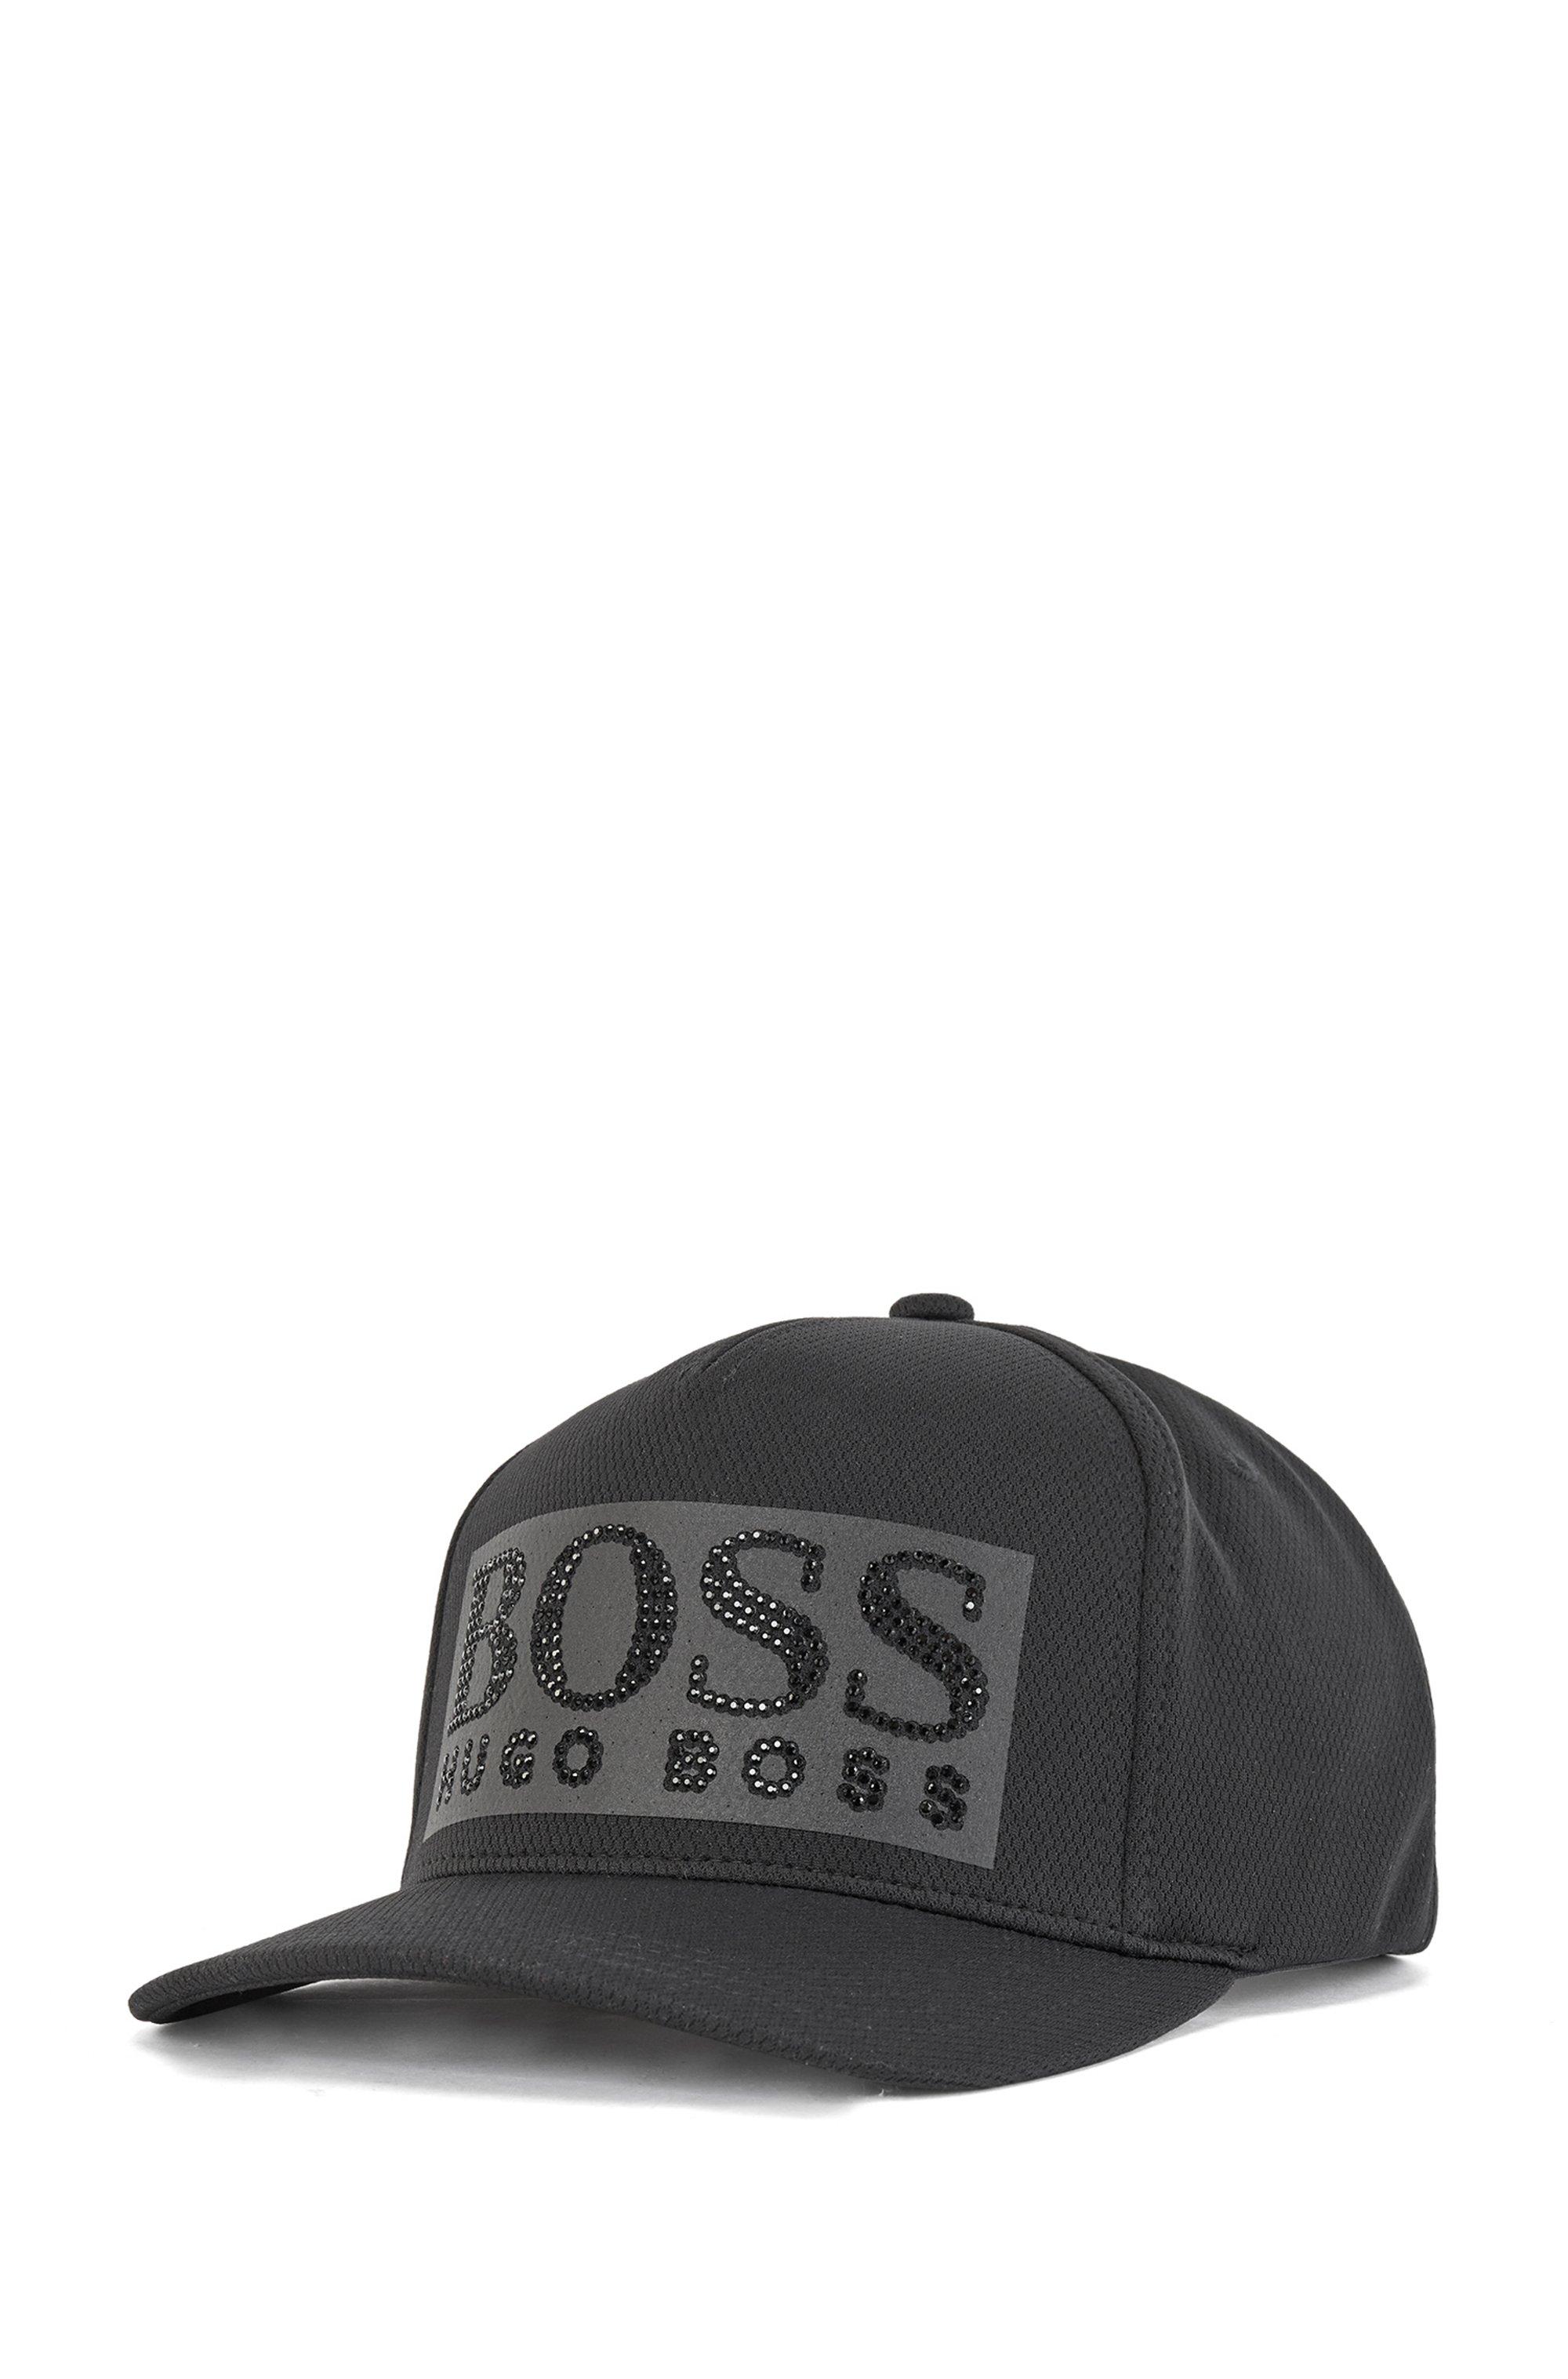 Honeycomb-jersey cap with black-rhinestone logo, Black